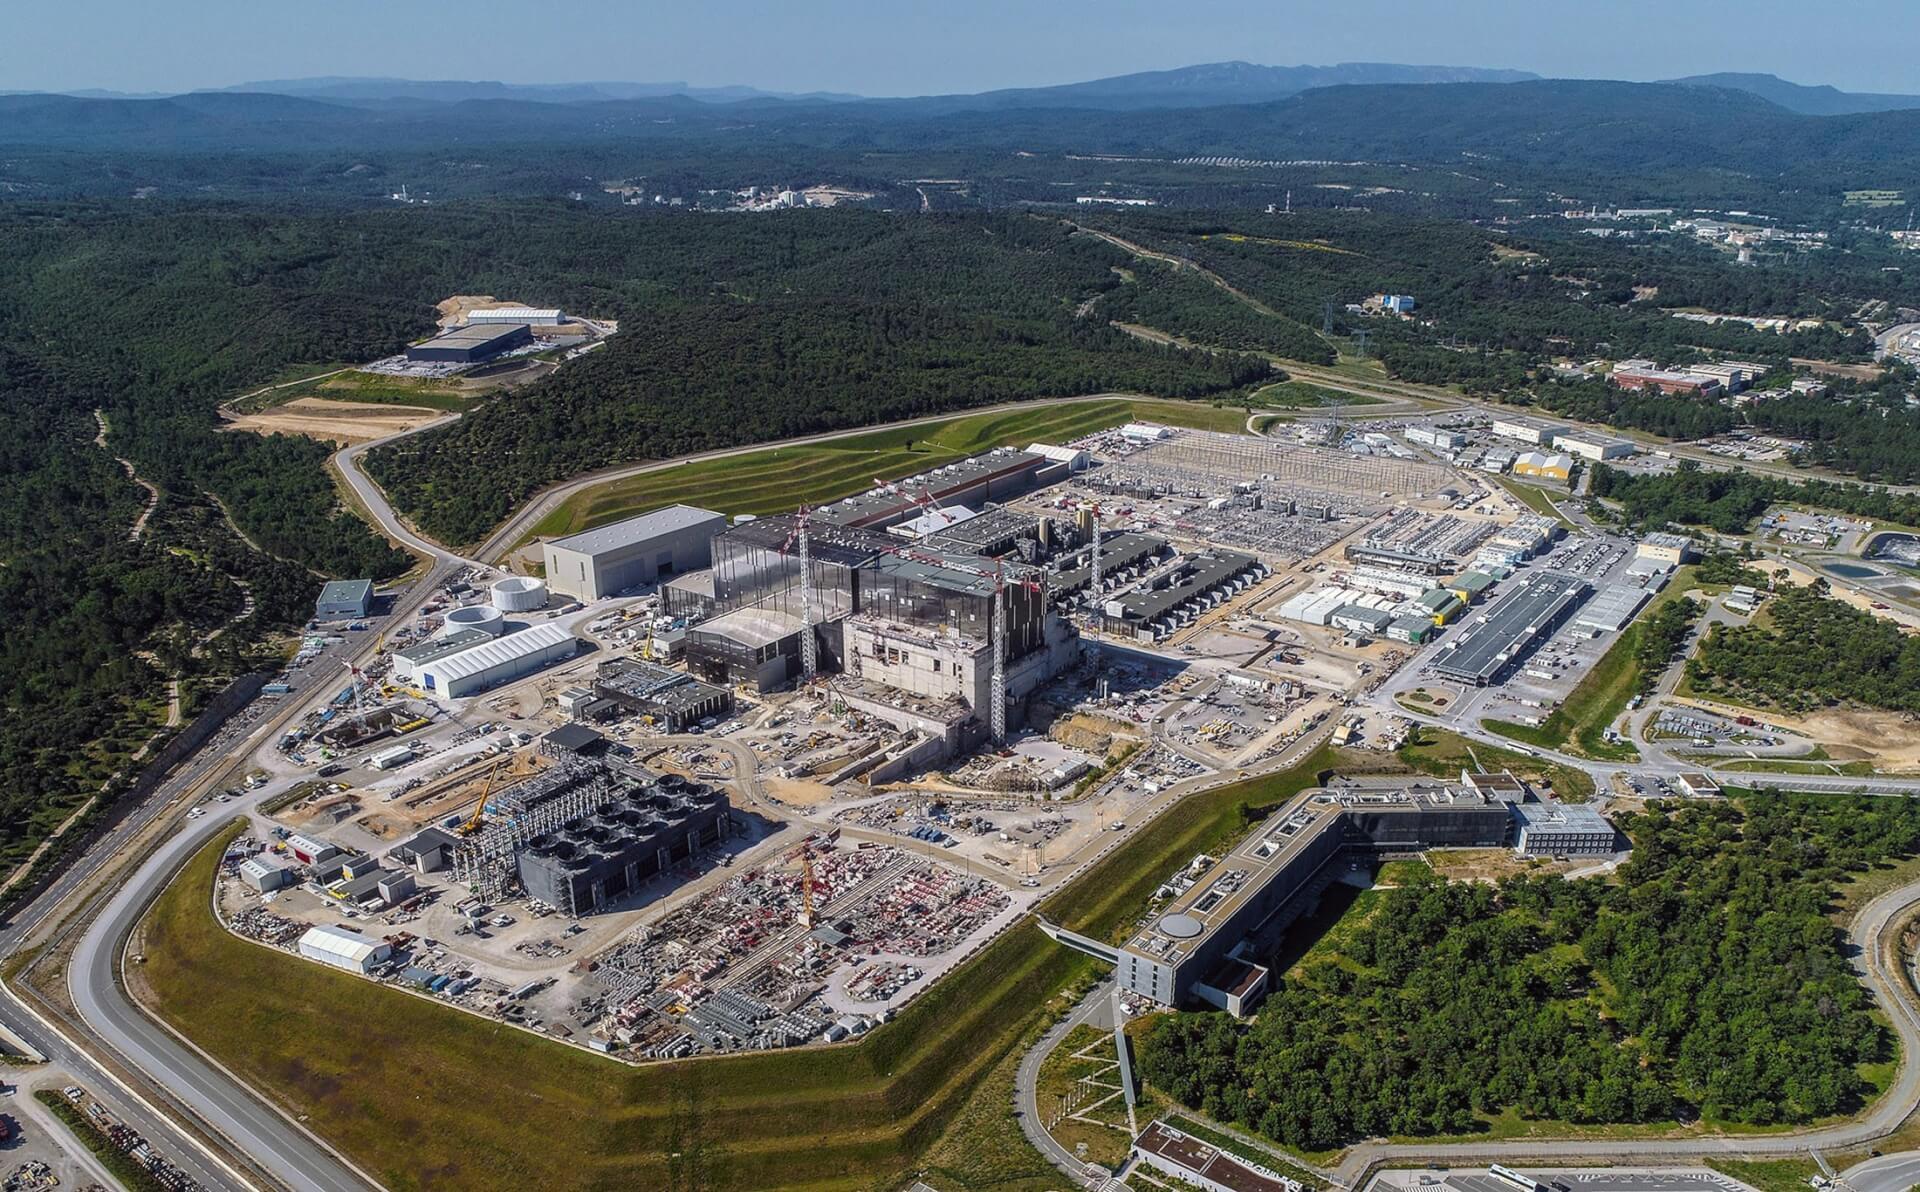 Výstavba mezinárodního tokamaku ITER na jihu Francie. Foto: ITER, Ústav fyziky plazmatu AV ČR